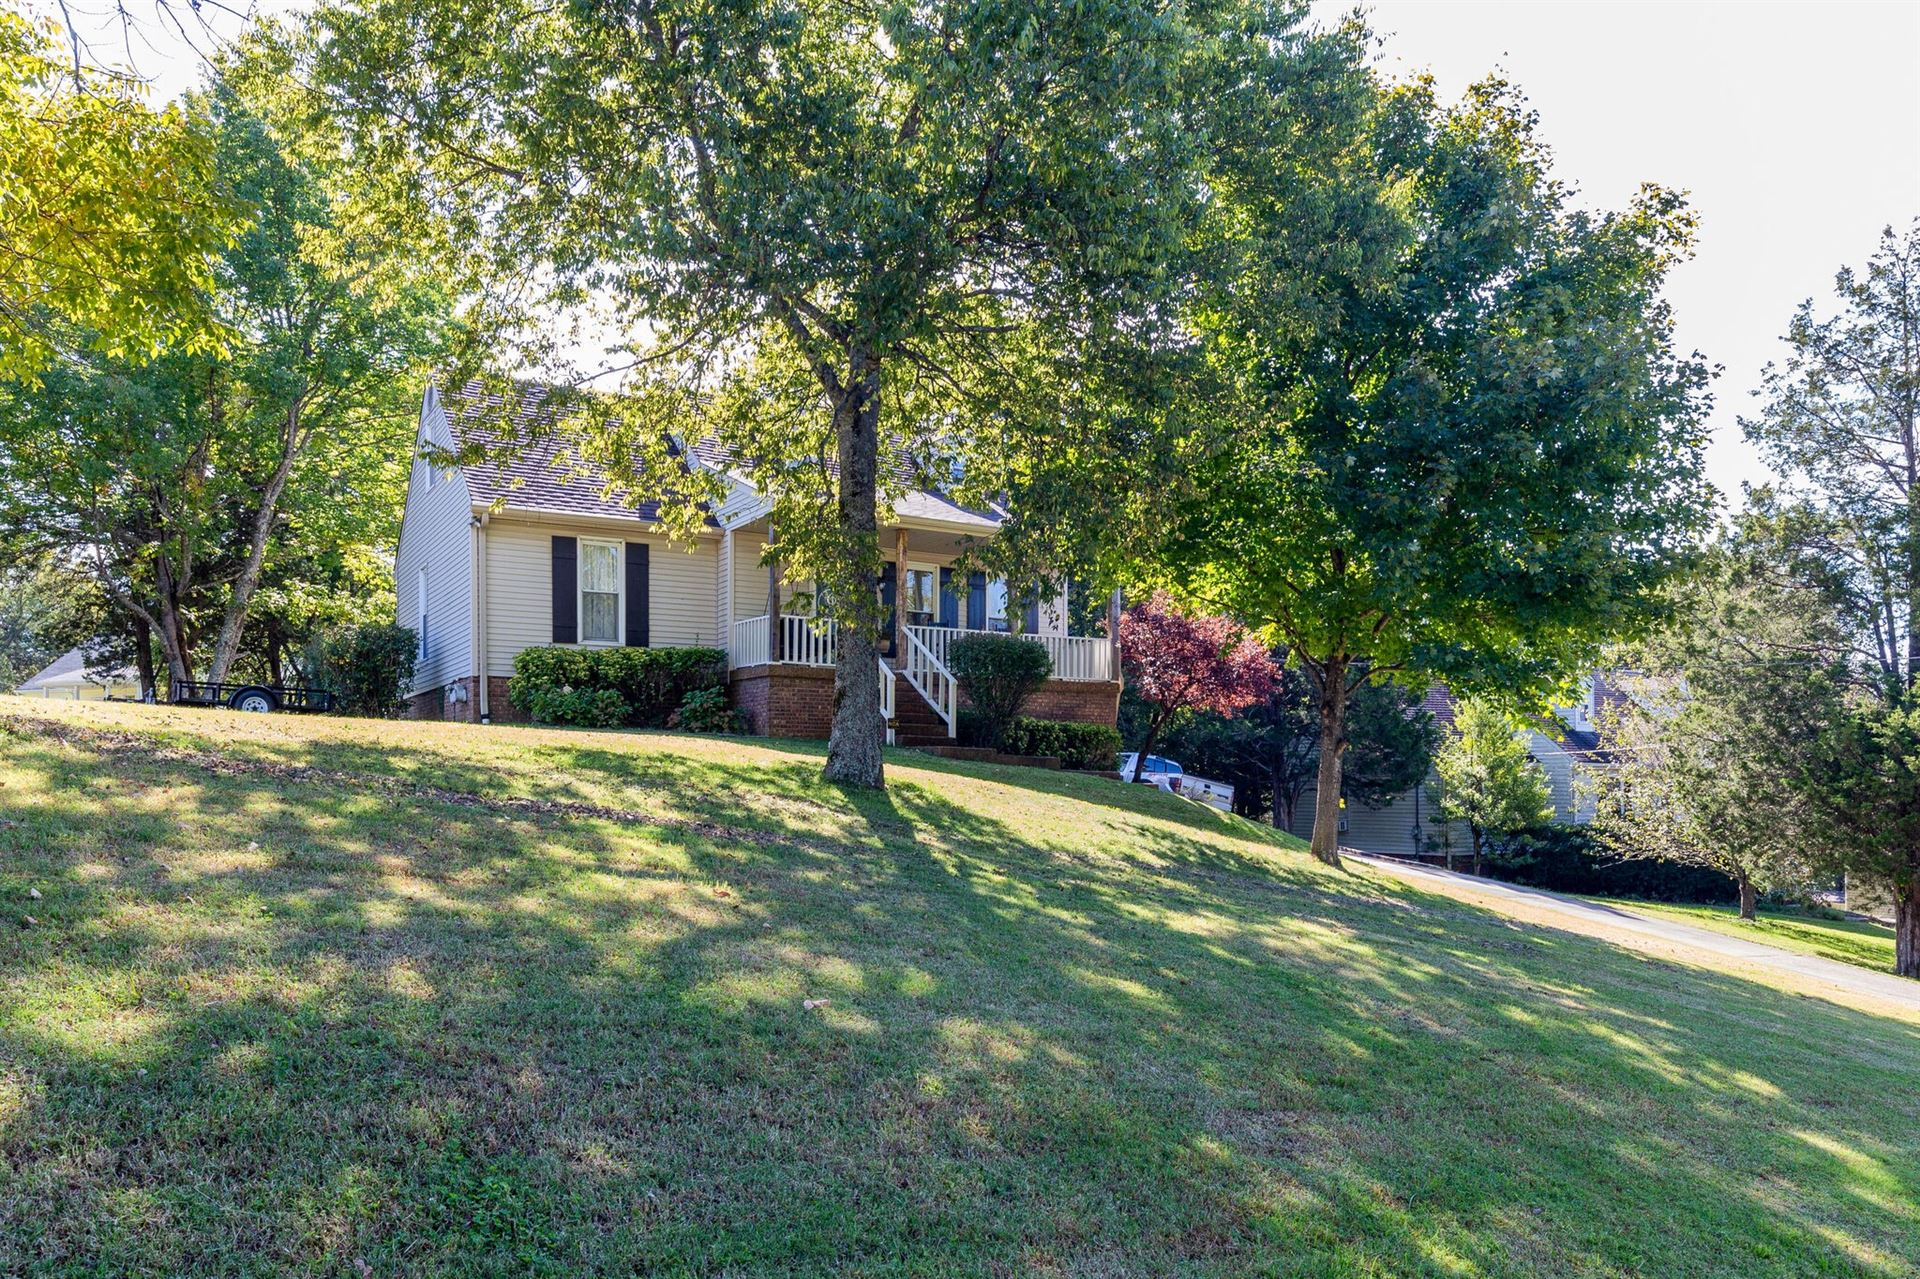 1228 Countryside Rd, Nolensville, TN 37135 - MLS#: 2301725